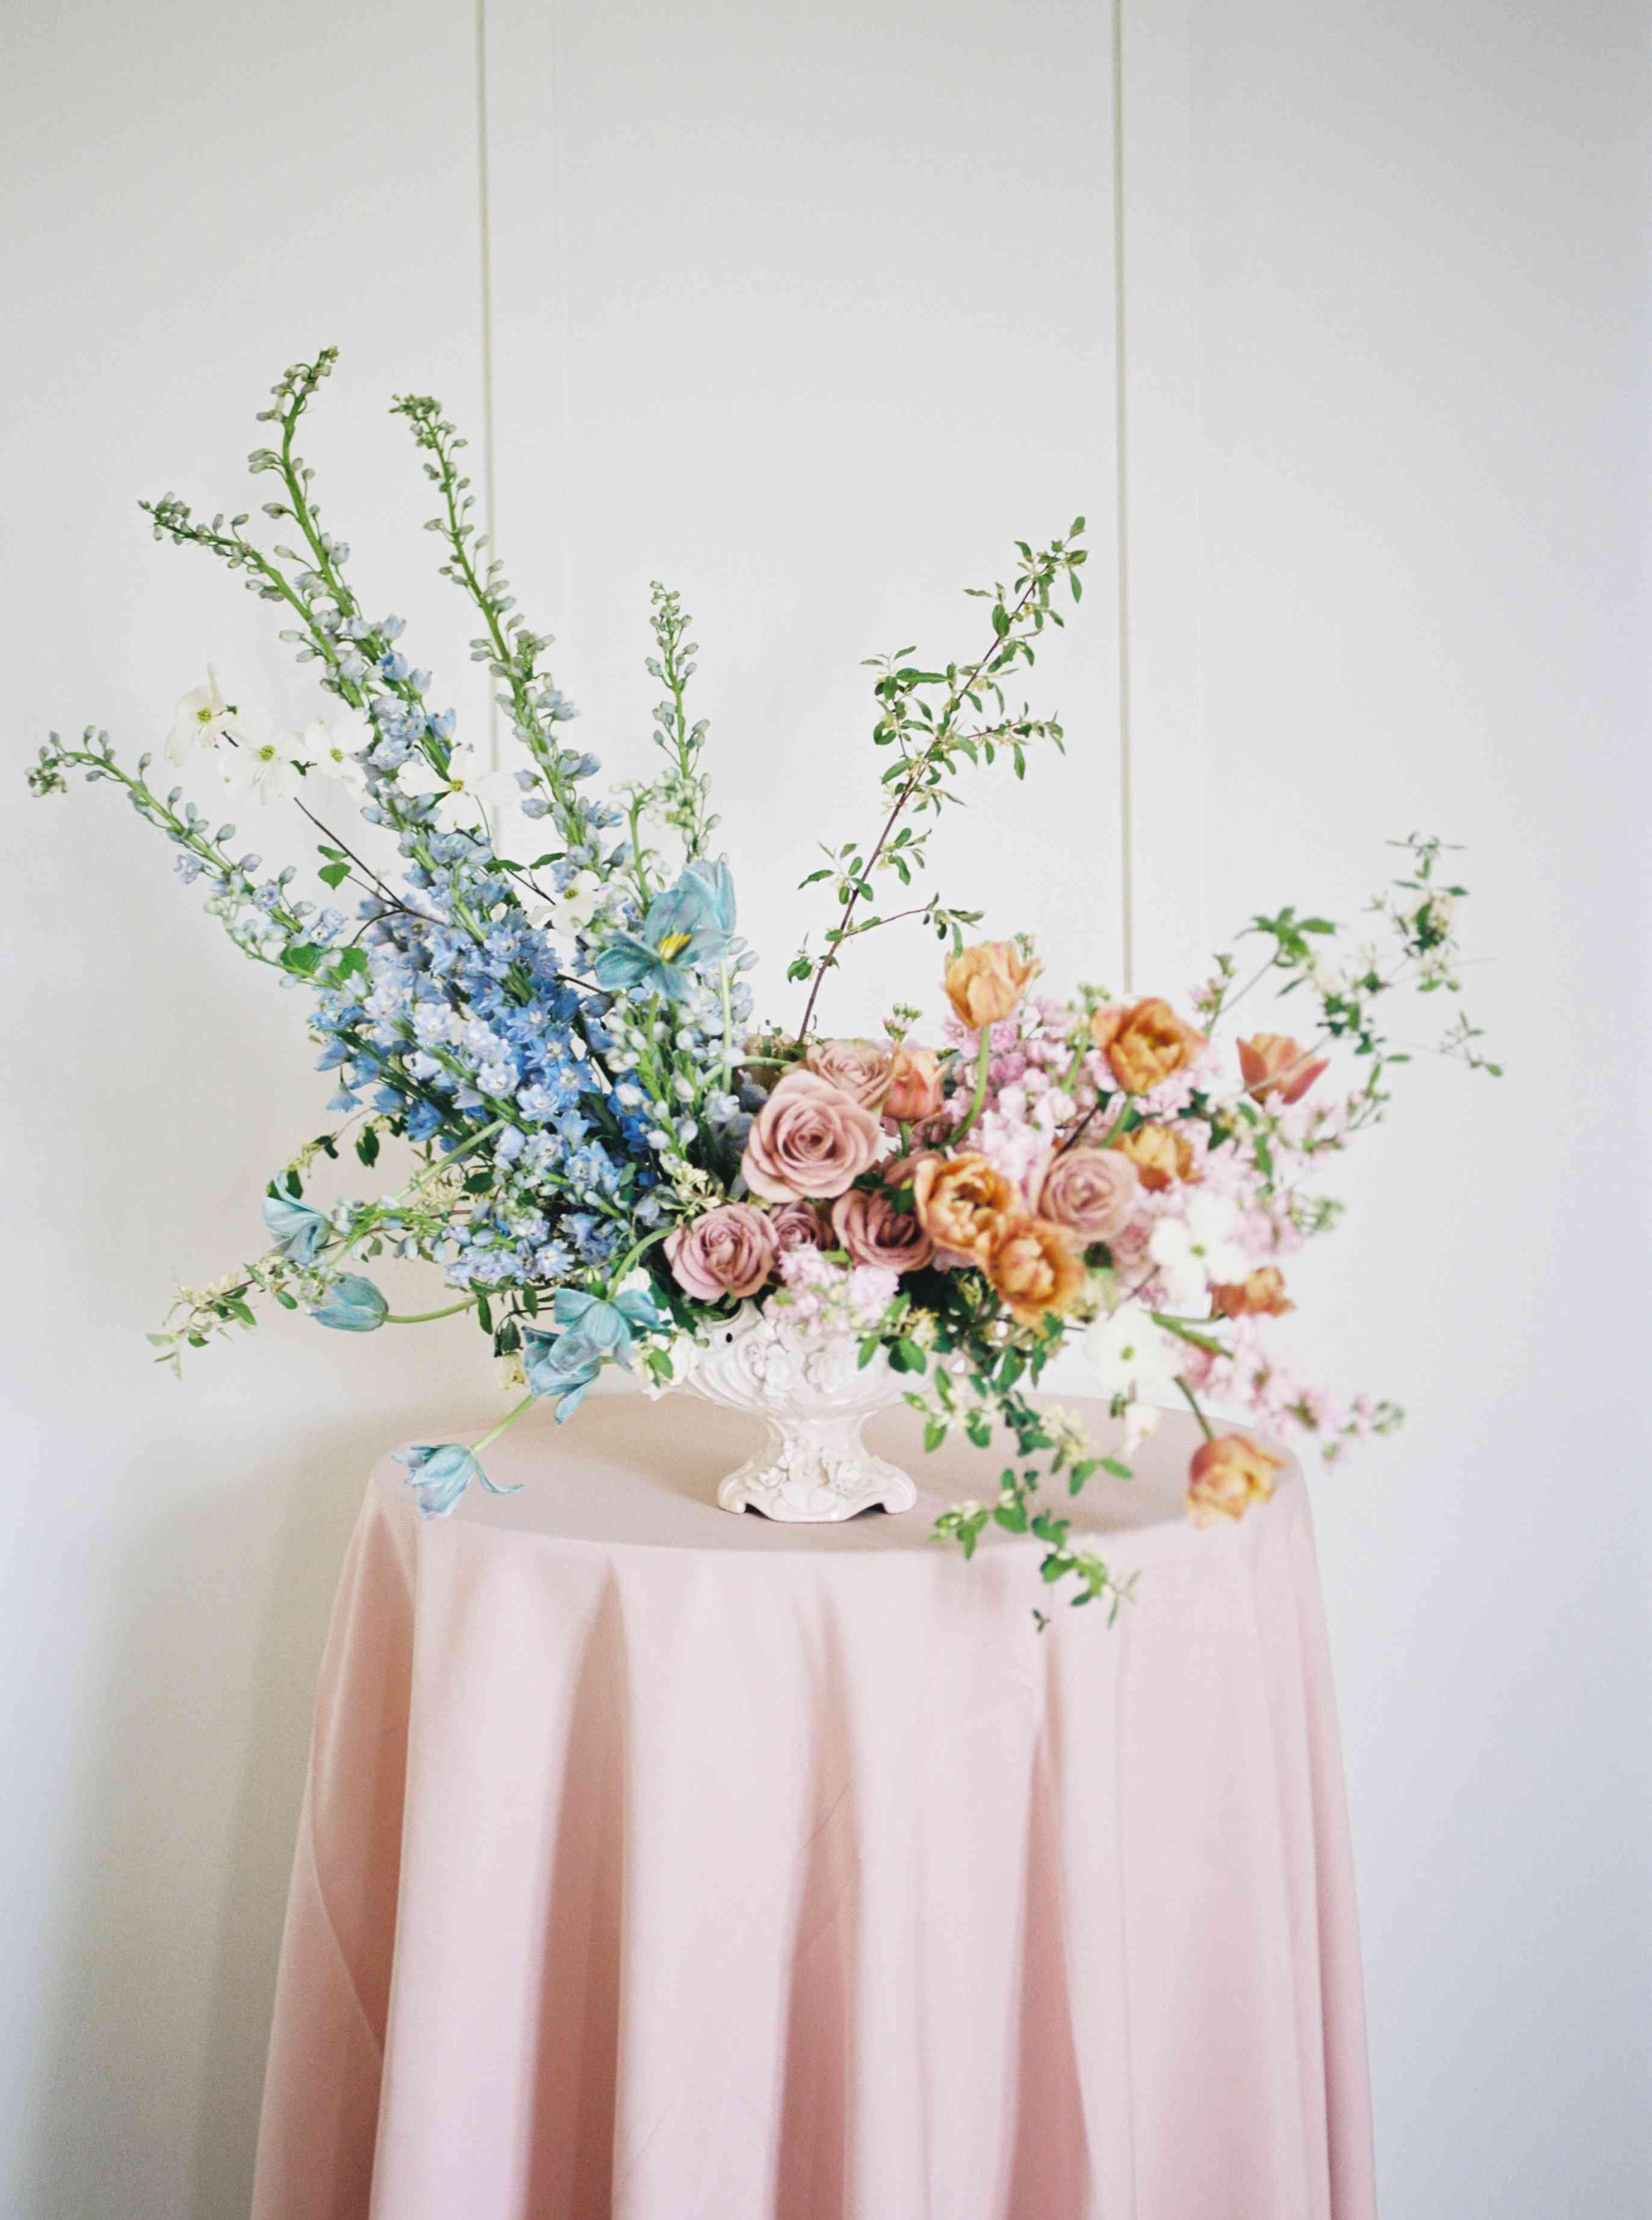 flower arrangement with long stems